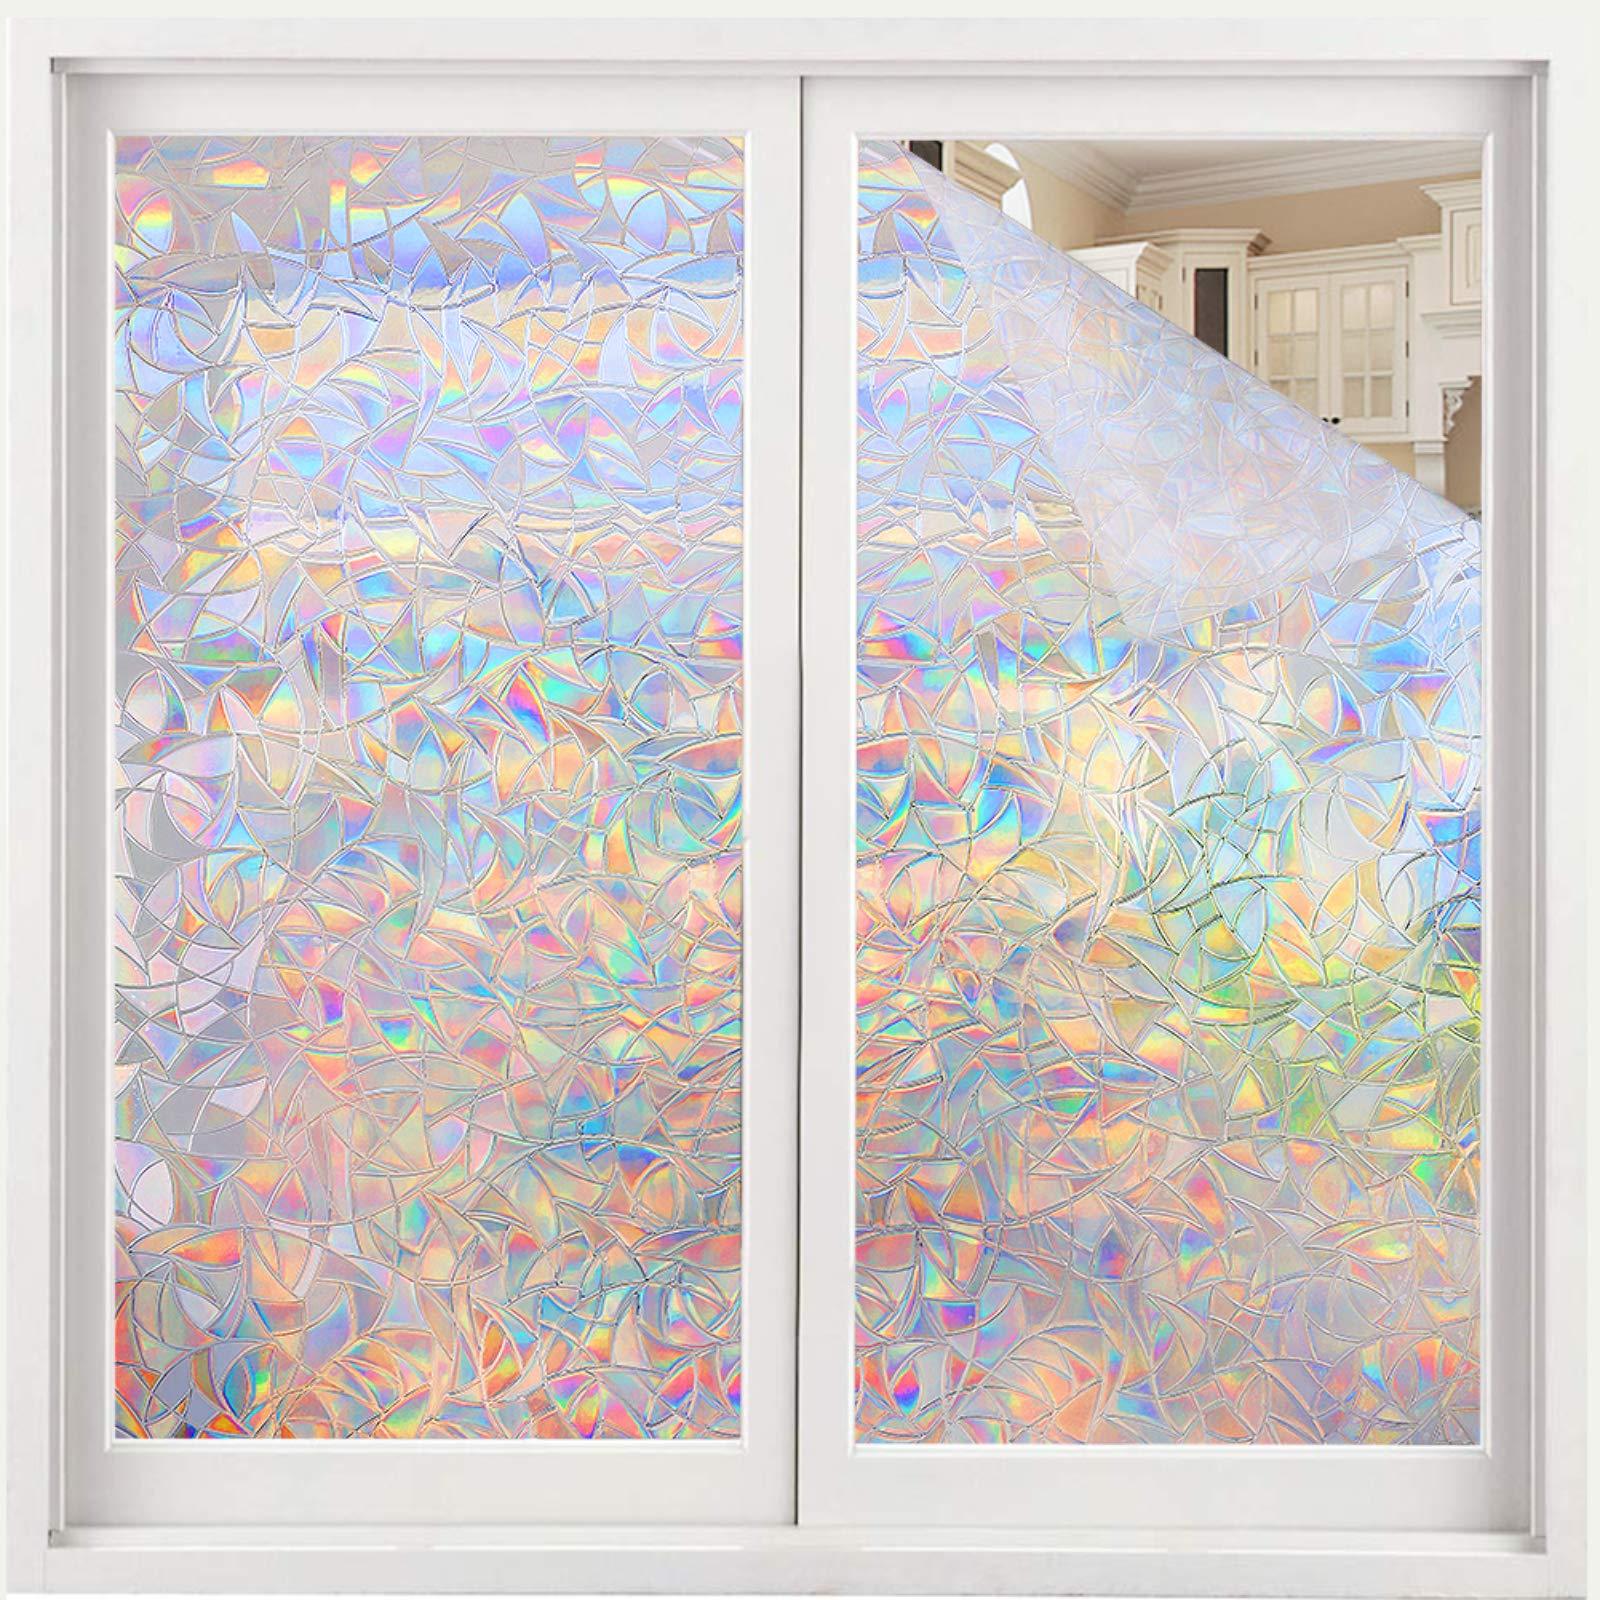 Volcanics Window Privacy Film Static Window Clings Vinyl 3D Window Decals Window Stickers Rainbow Window Film for Glass Door Home Heat Control 35.4 x 118 Inches